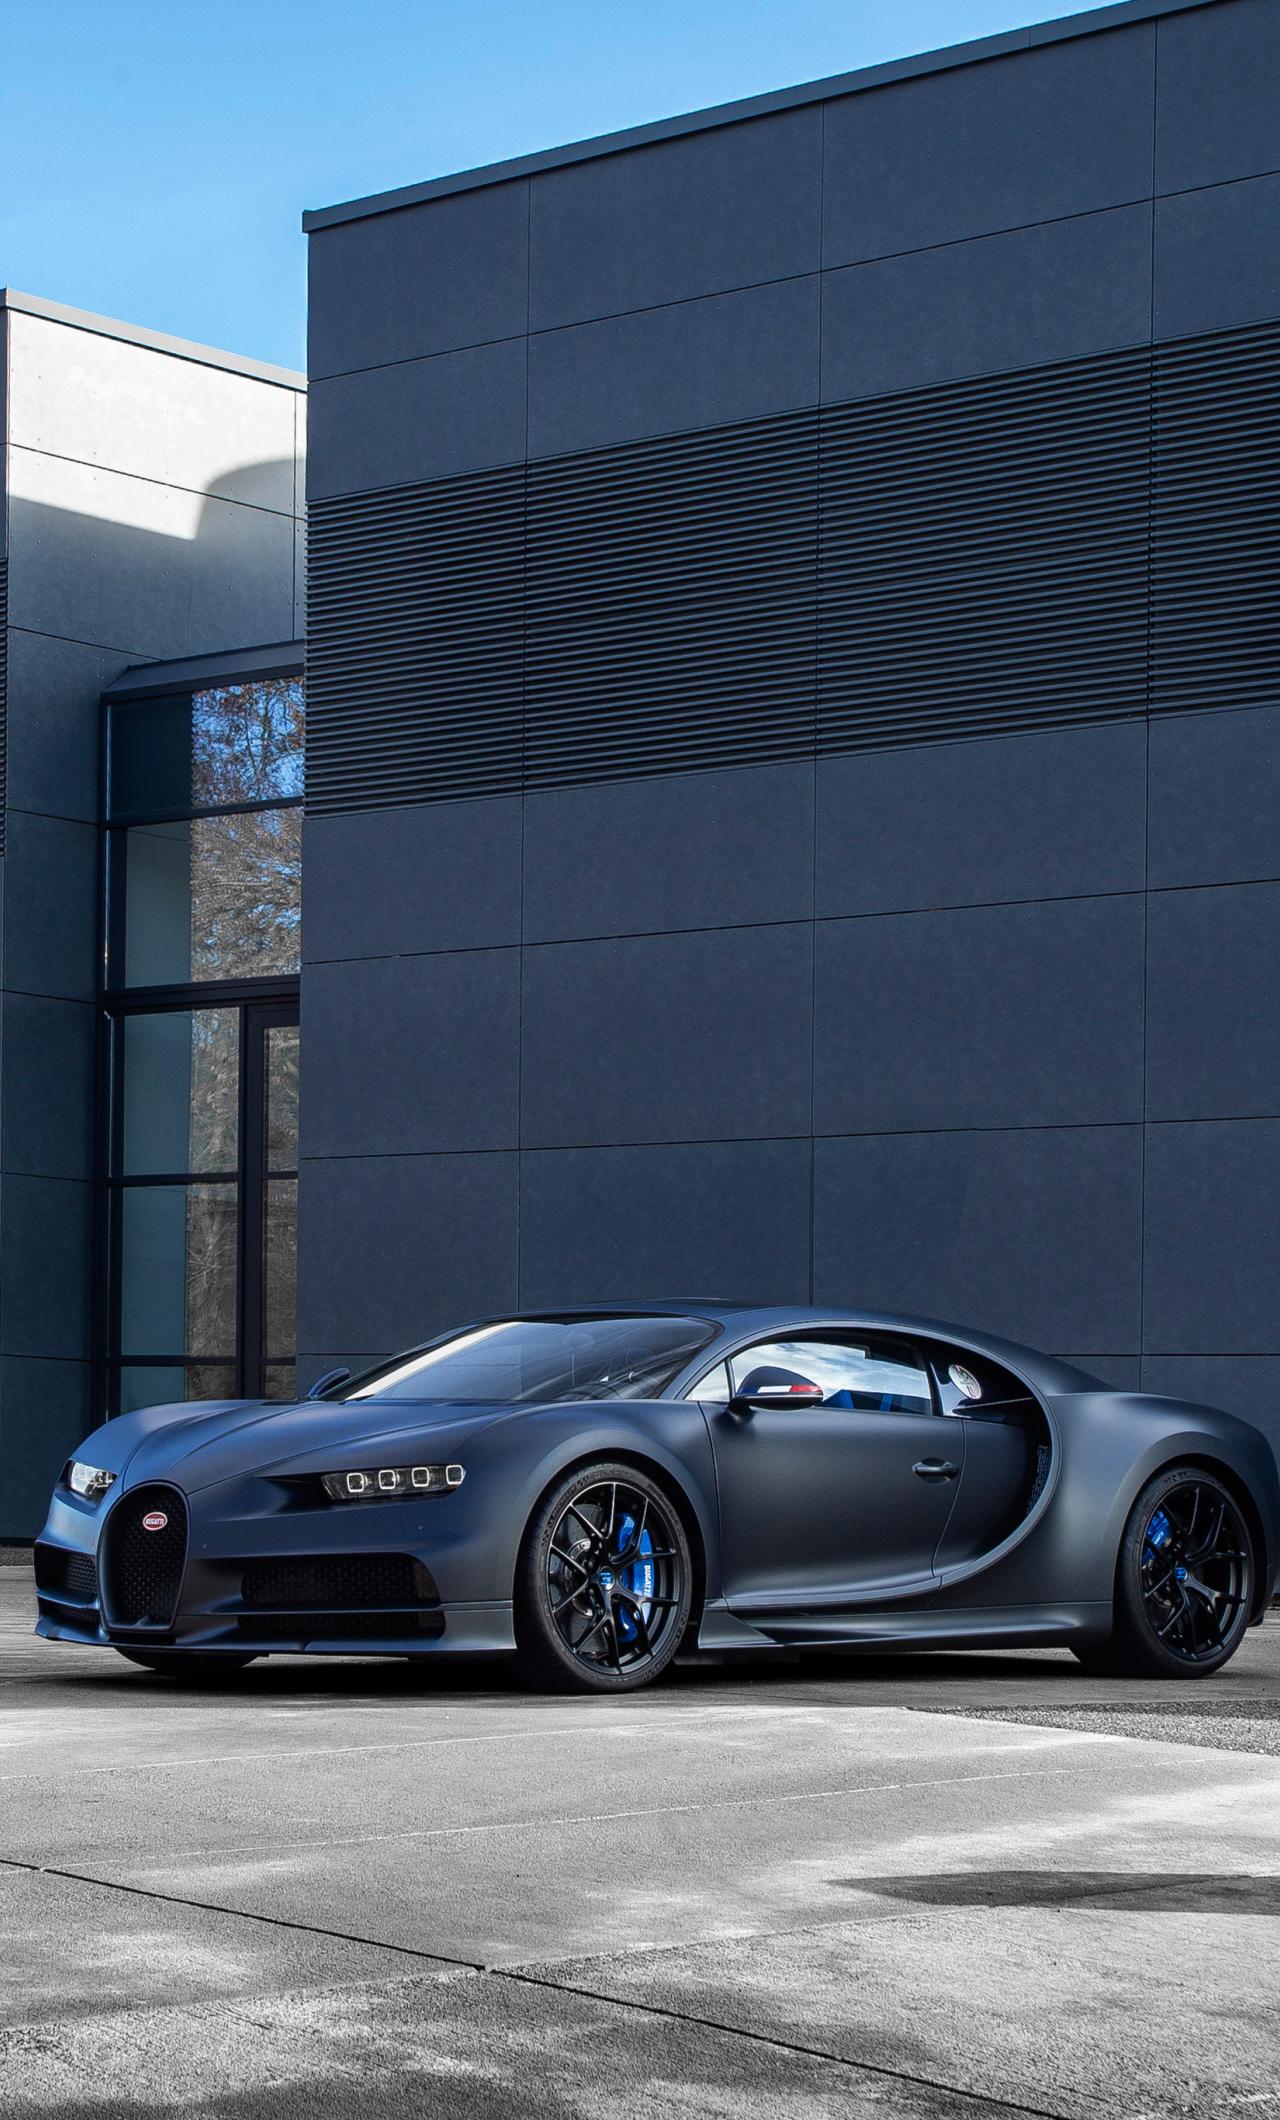 Download 1280x2120 Wallpaper Bugatti Chiron Sport 110 Ans Luxury Vehicle 2019 Iphone 6 Plus 1280x2120 Hd Image Background 19536